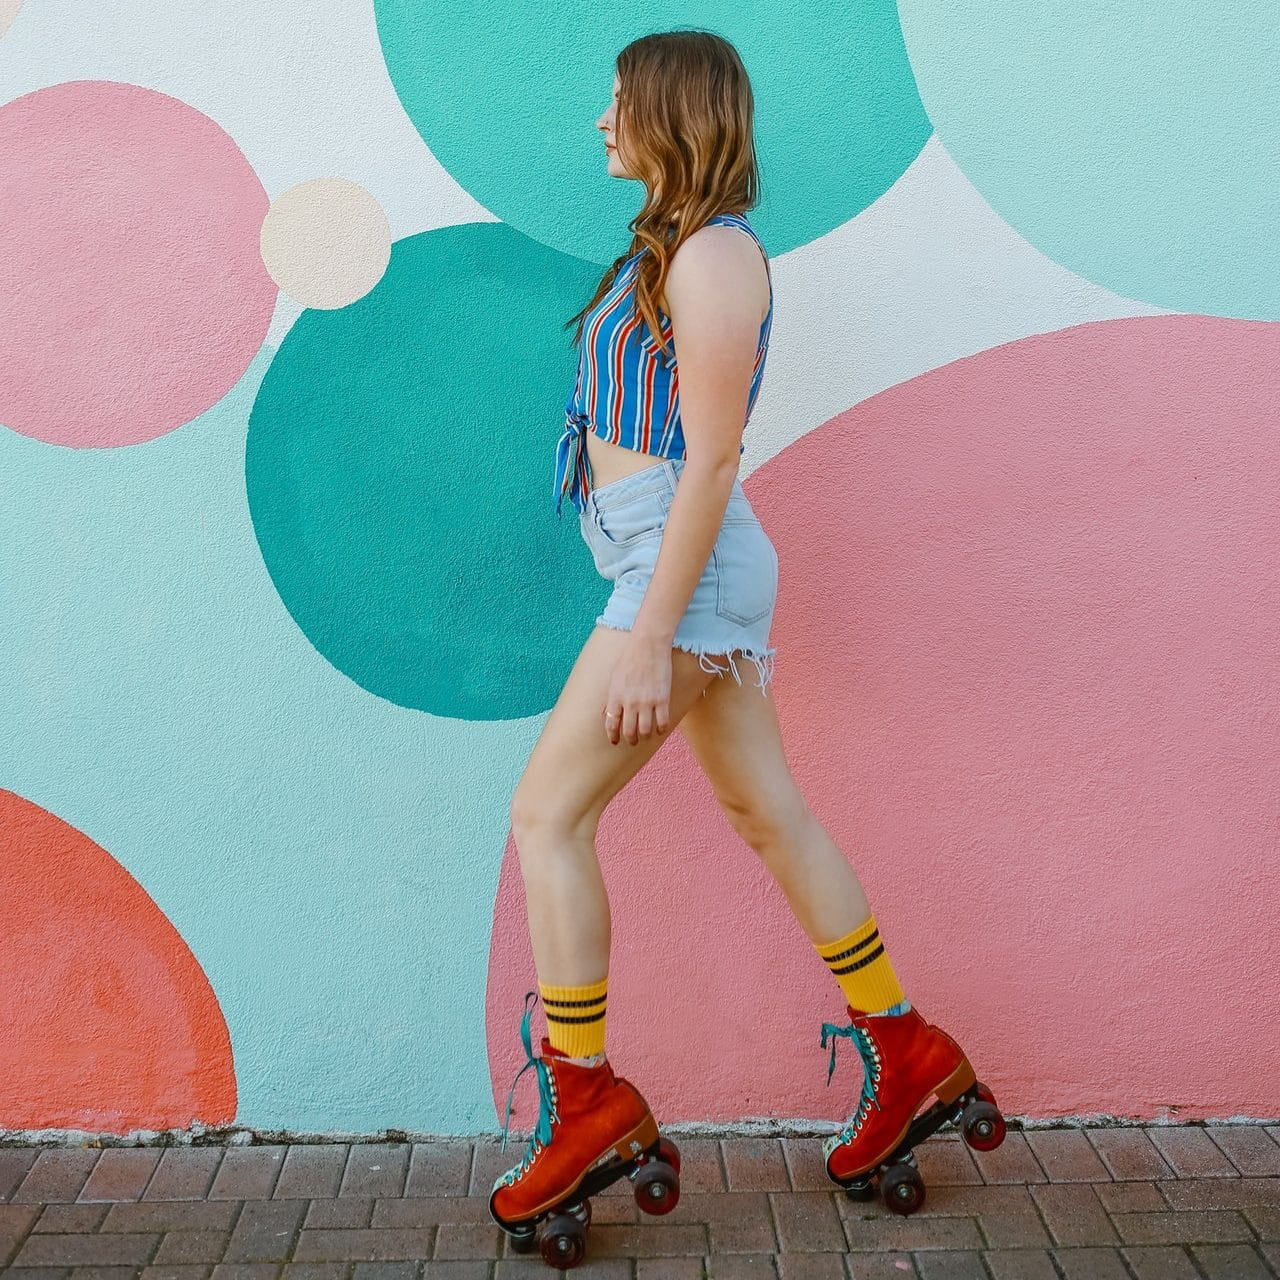 Woman in trendy roller skates in front of street art mural